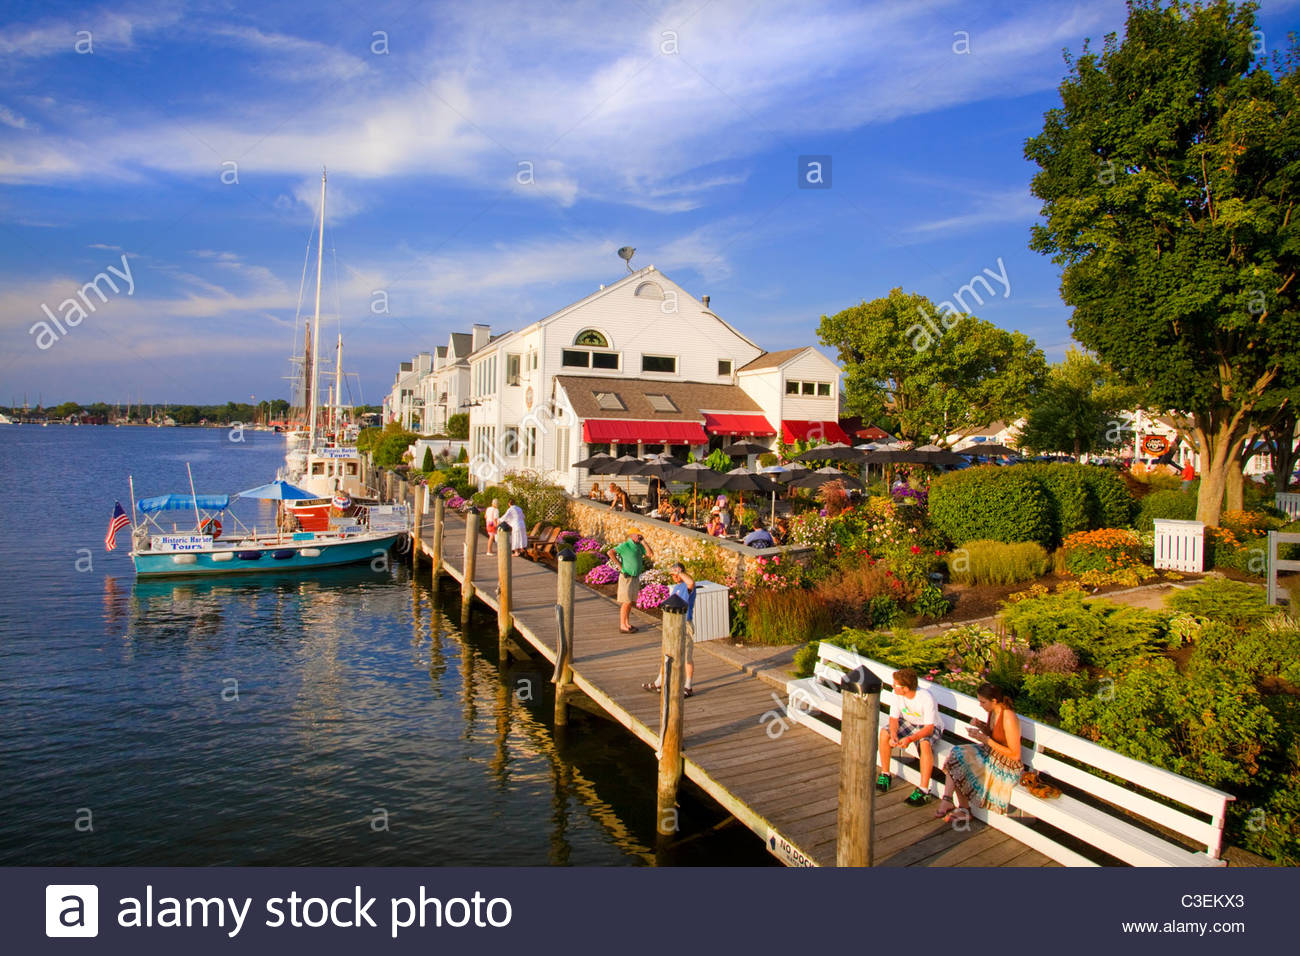 S&P [empresa] restaurante Oyster y Dock. Downtown Mystic, Connecticut. Foto de stock